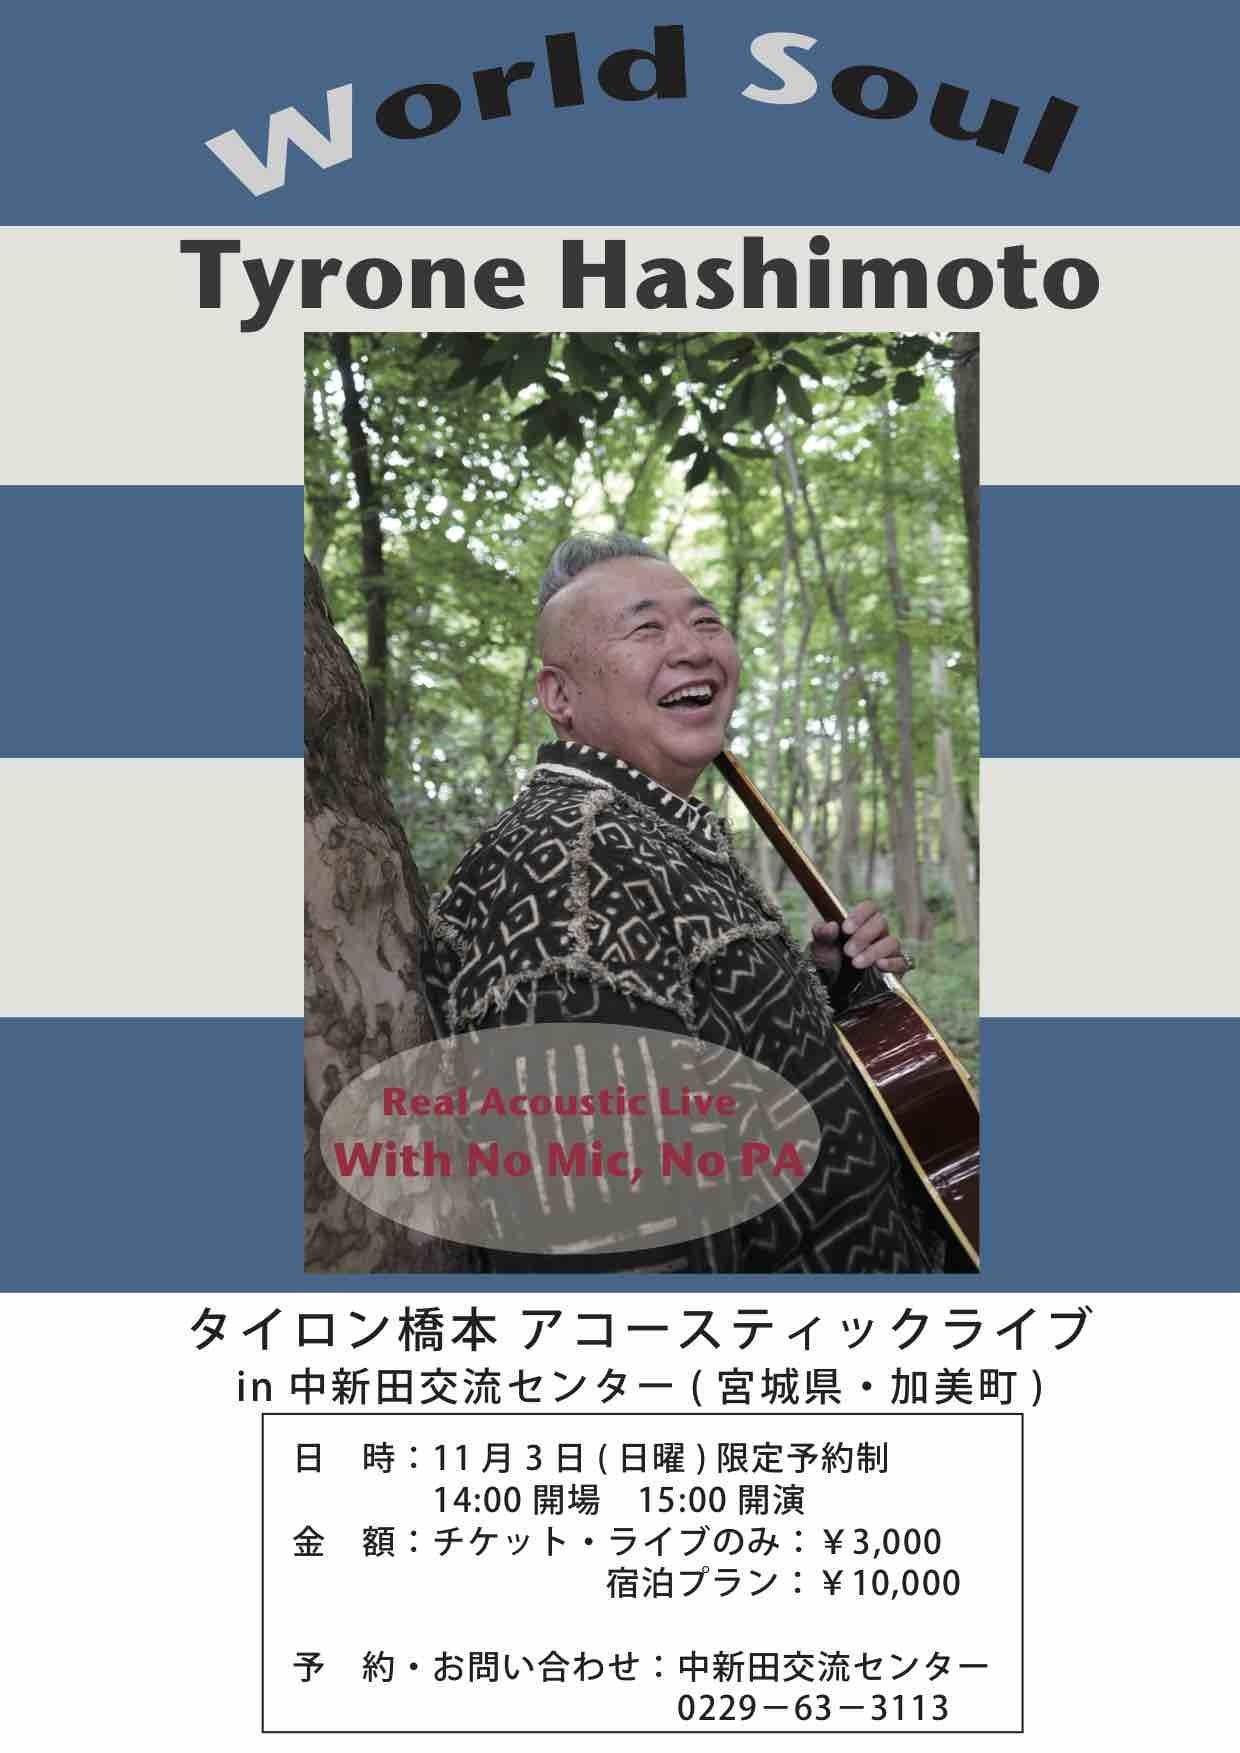 Tyrone Hashimoto 11月 ライブ情報_c0368808_15360699.jpg